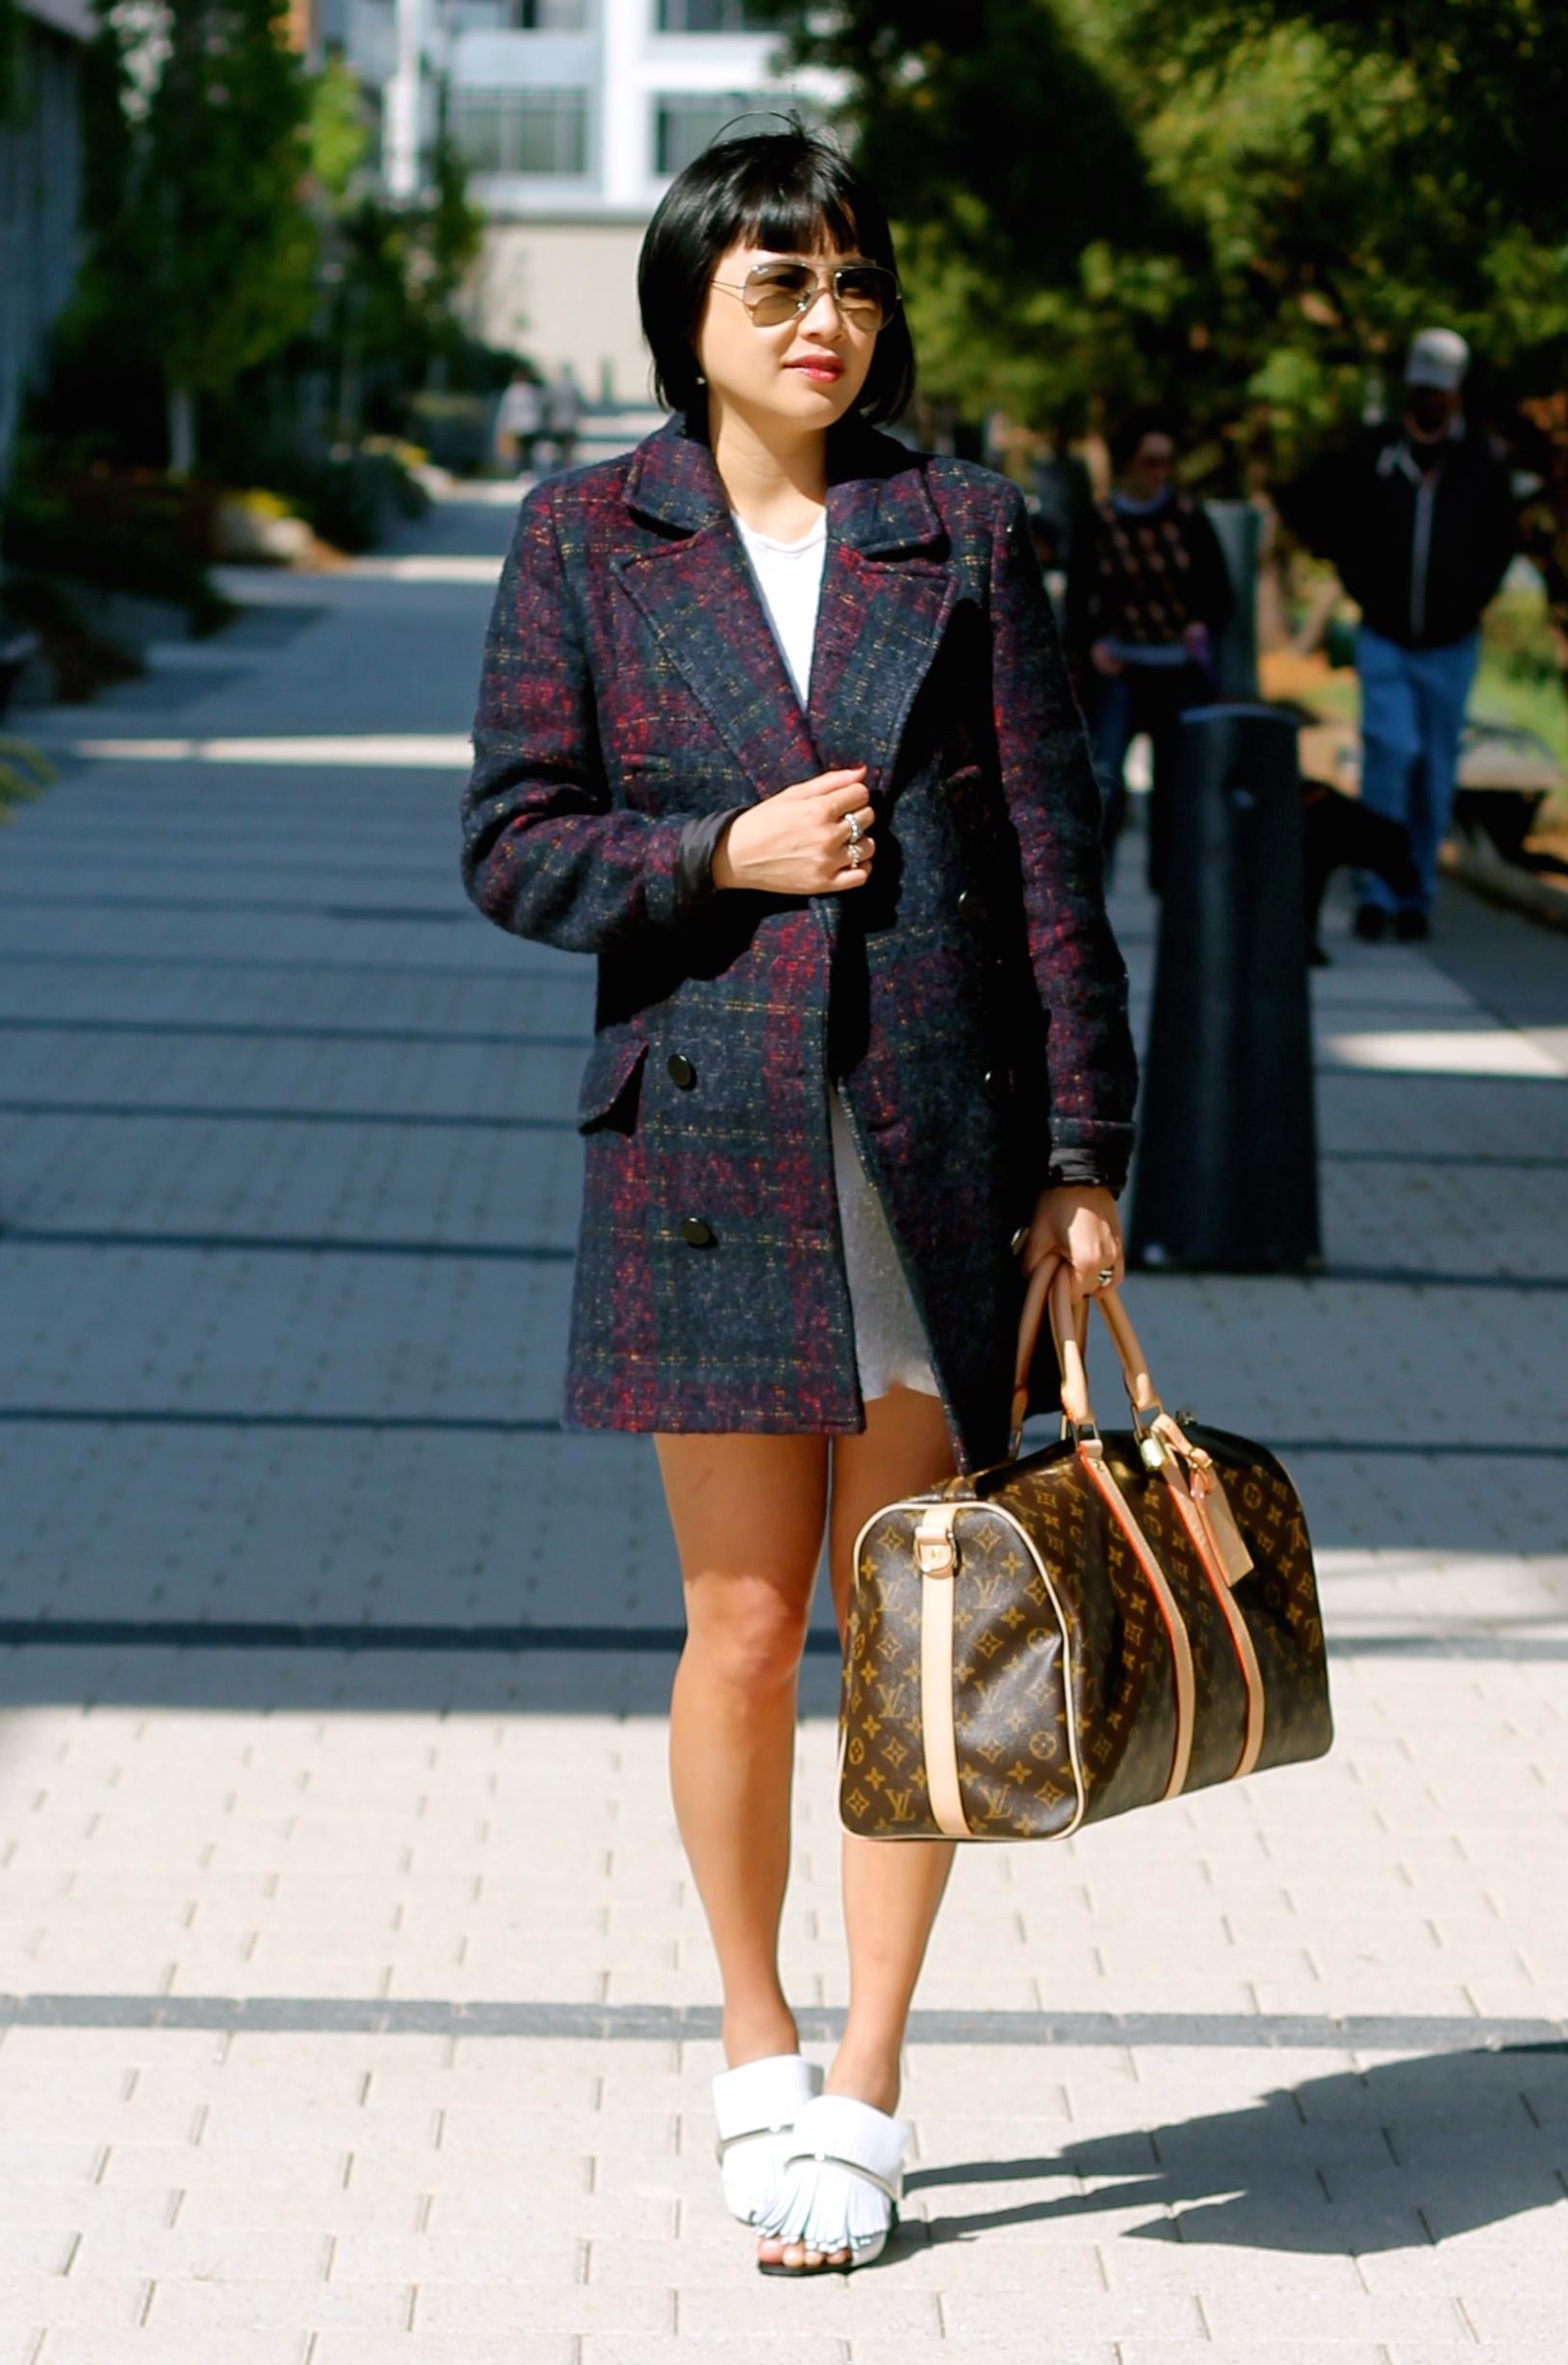 Zara coat, Aritzia dress, Louis Vuitton bag, Proenza Schouler shoes, Ray-Ban sunglasses